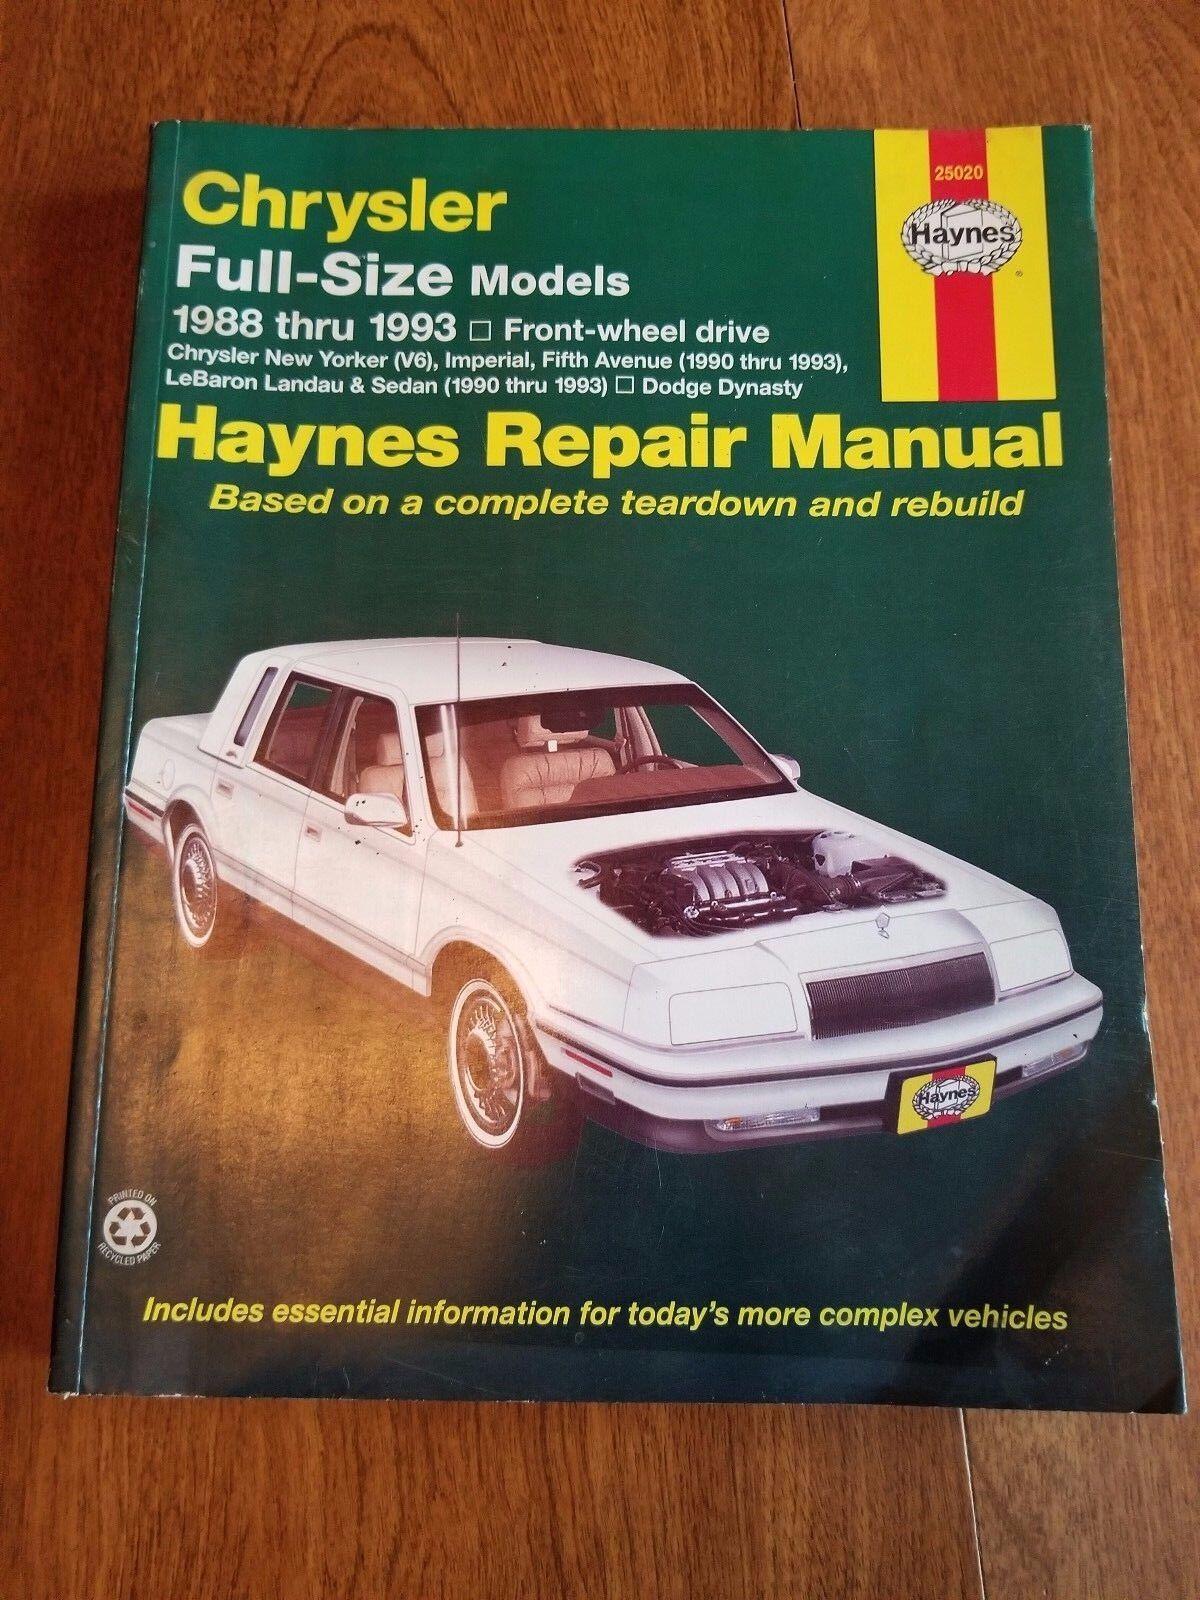 Haynes Repair Manual 25020 CHRYSLER Dodge 1988-1993 FWD LeBaron 5th Ave  Dynasty | eBay